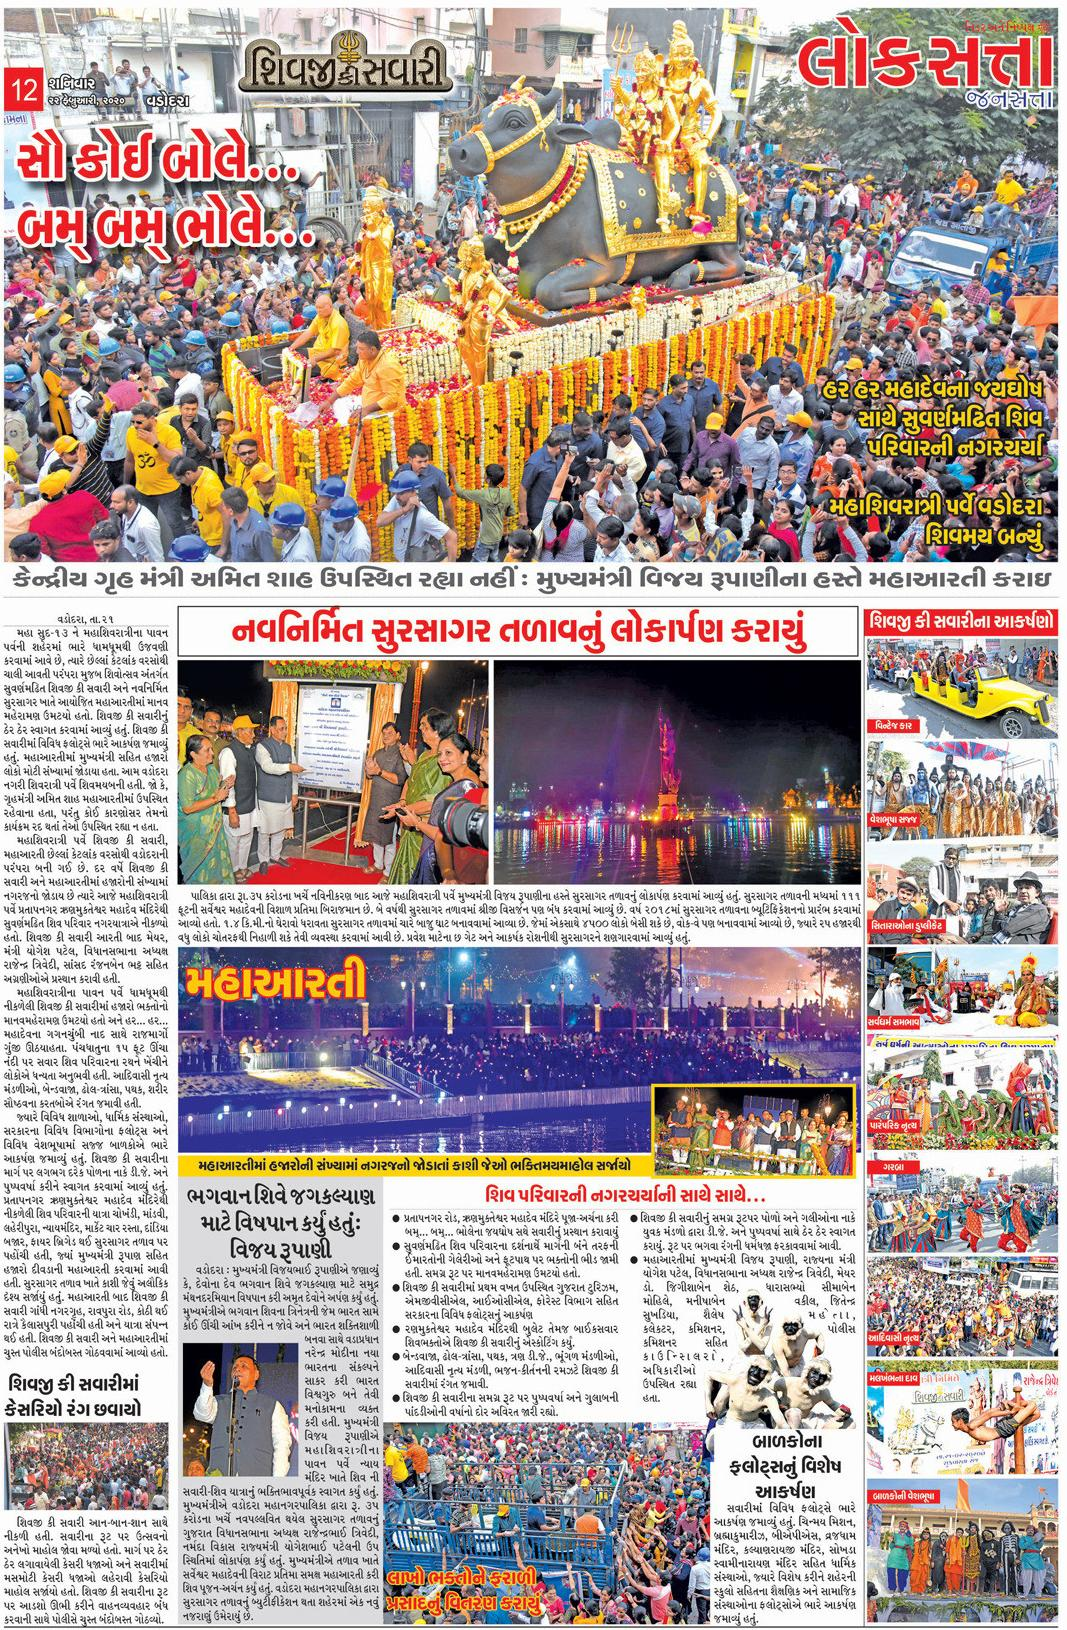 Loksatta Jansatta News Papaer E-paper dated 2020-02-22 | Page 12